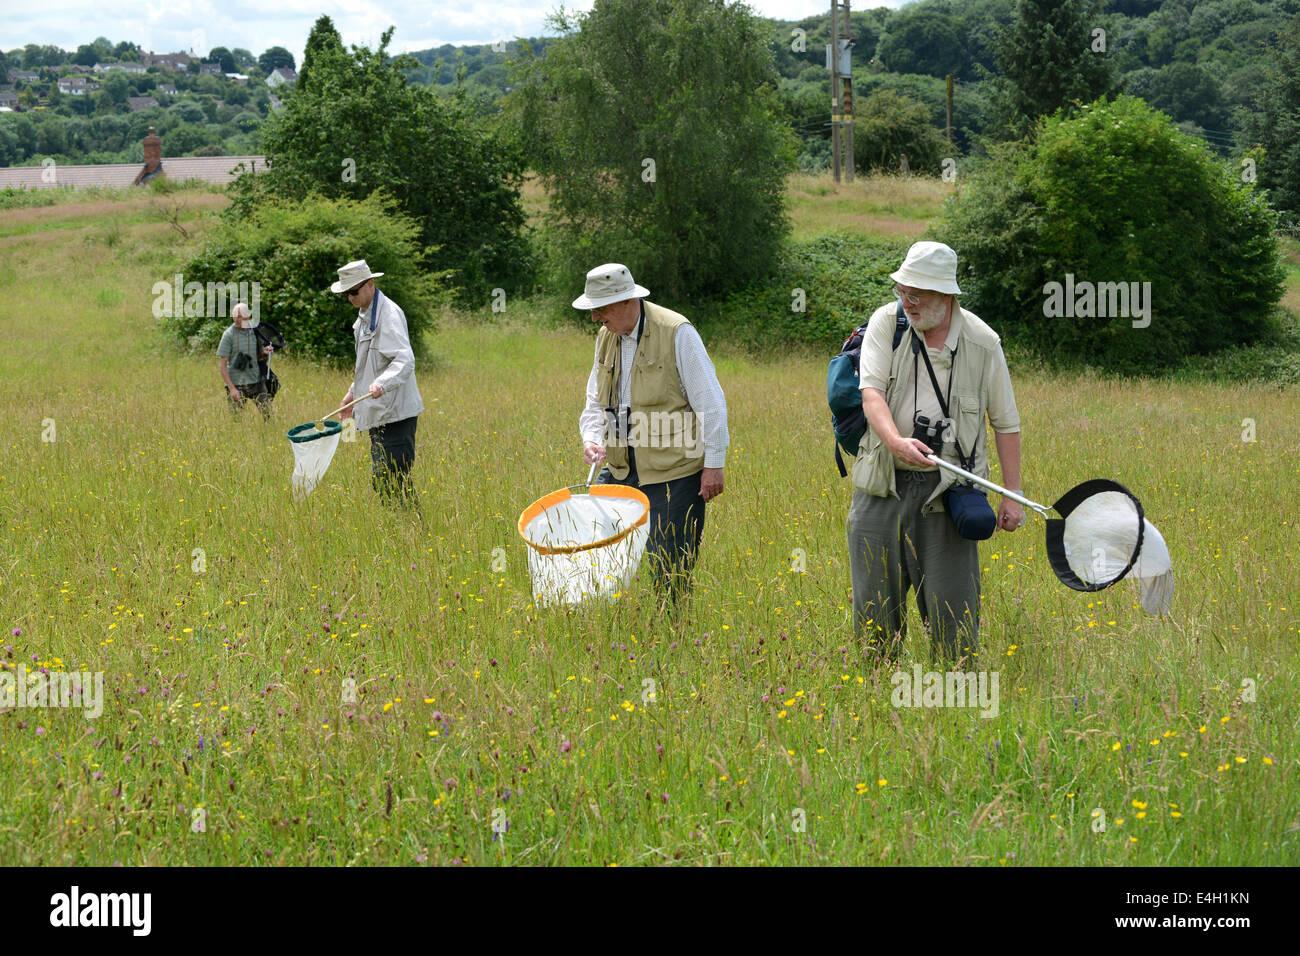 Shropshire Invertebrate Group Entomologists sweep netting for Invertebrates survey of the Lodge Field - Stock Image